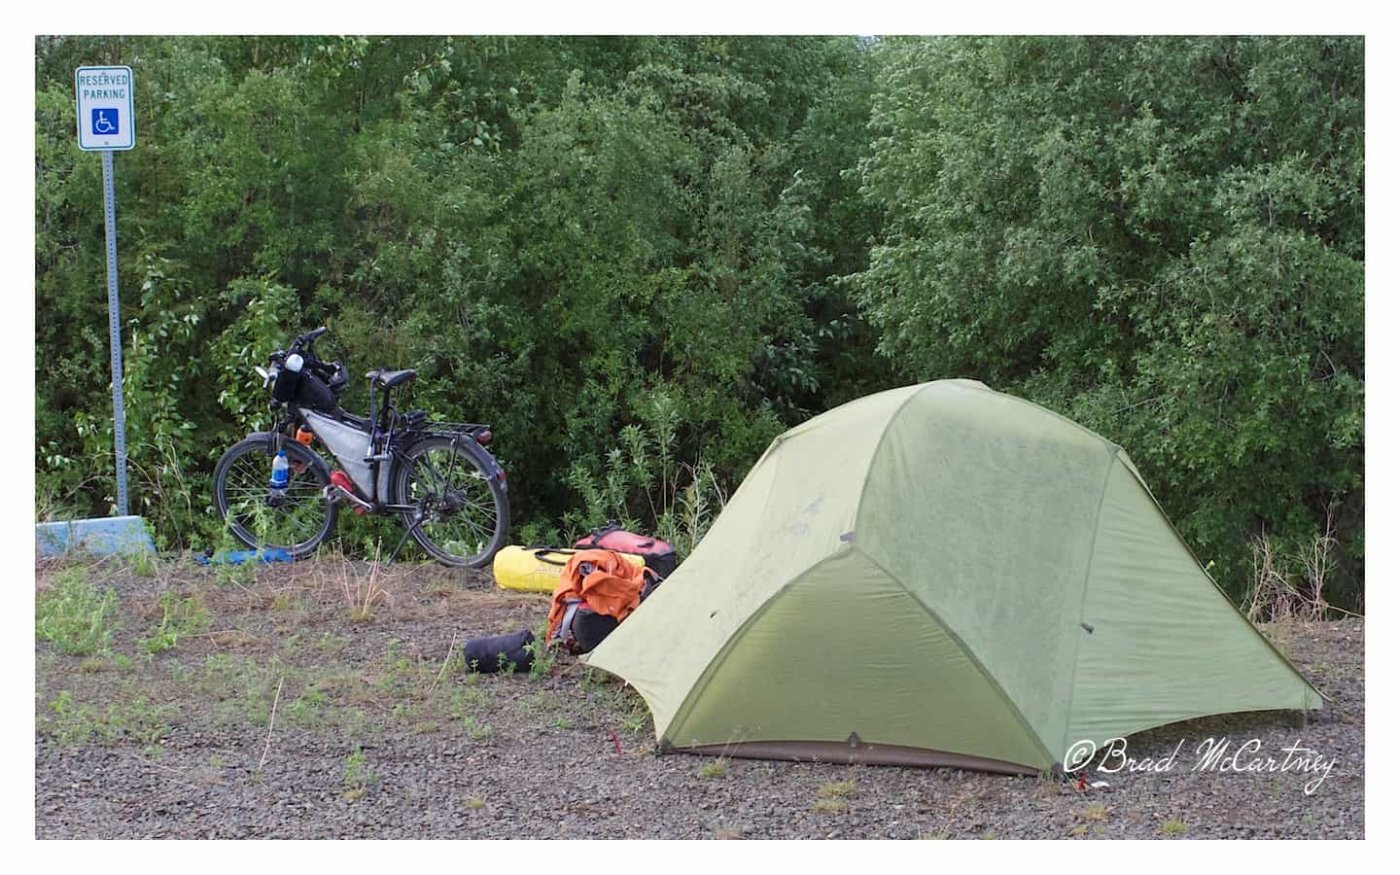 Yukon River campsite dalton highway